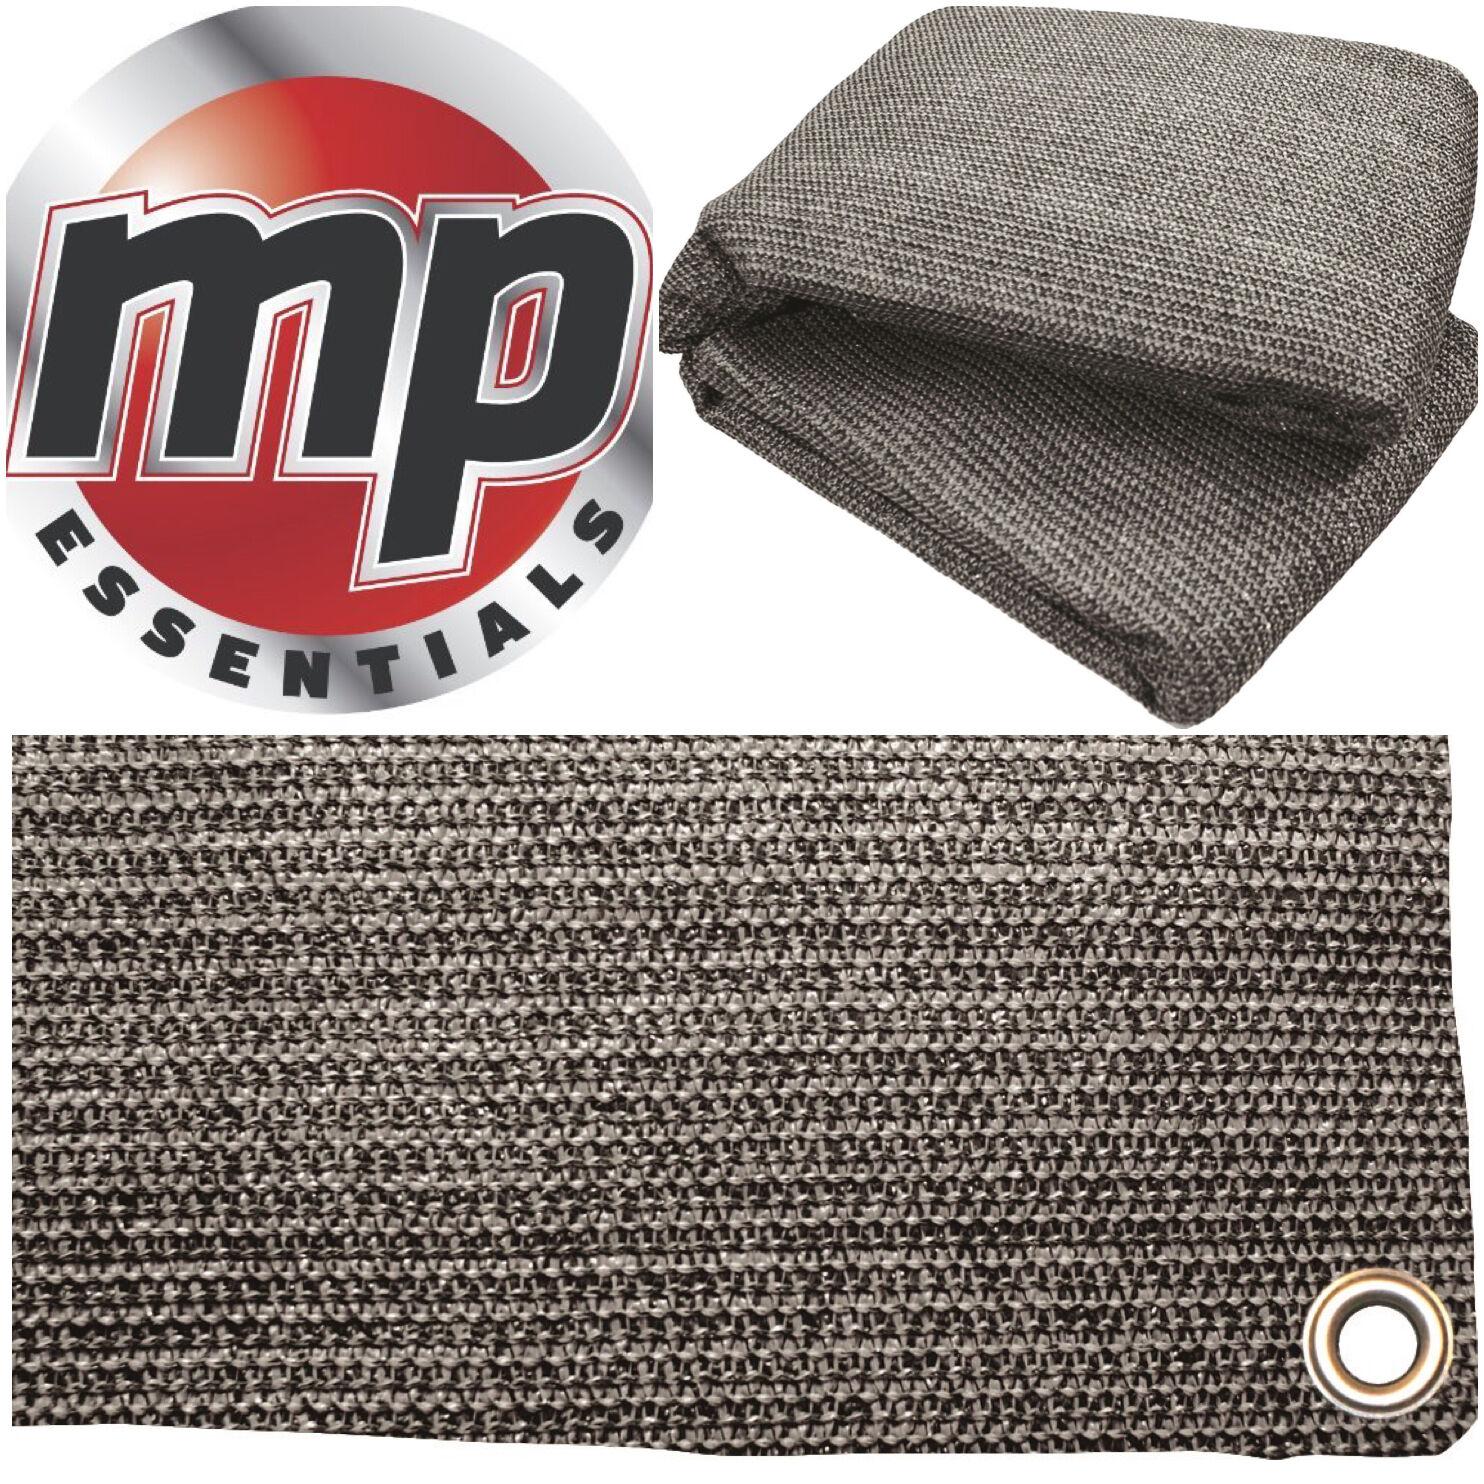 Anthracite & Grey Weaved Groundsheet Tent & Caravan Awning Carpet Mat - 2.5x6.5m